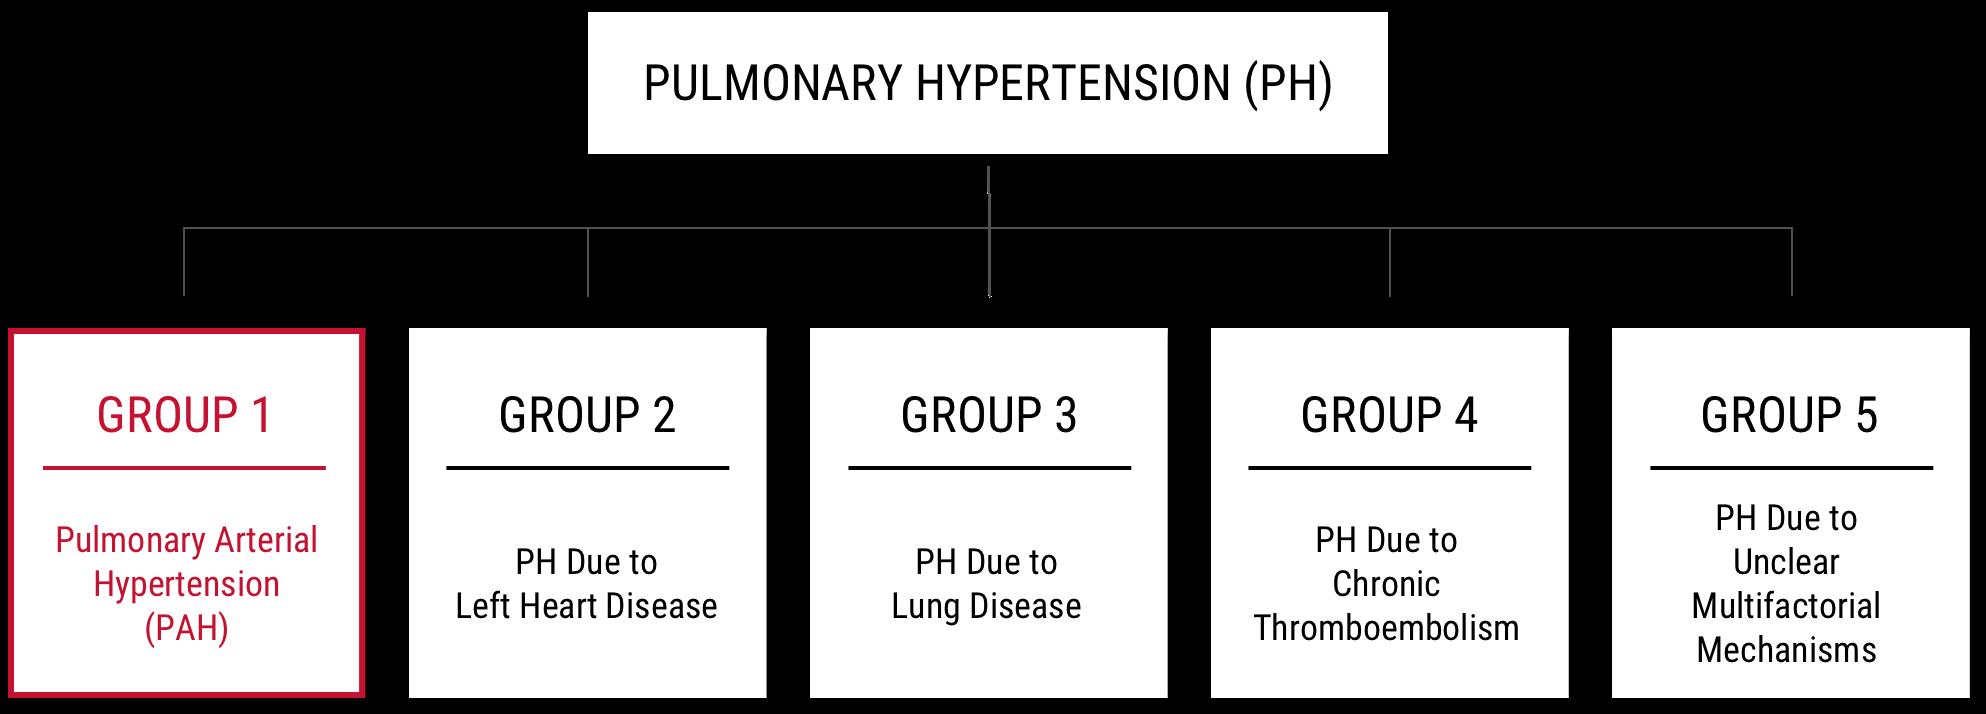 Pulmonary Hypertension Classification